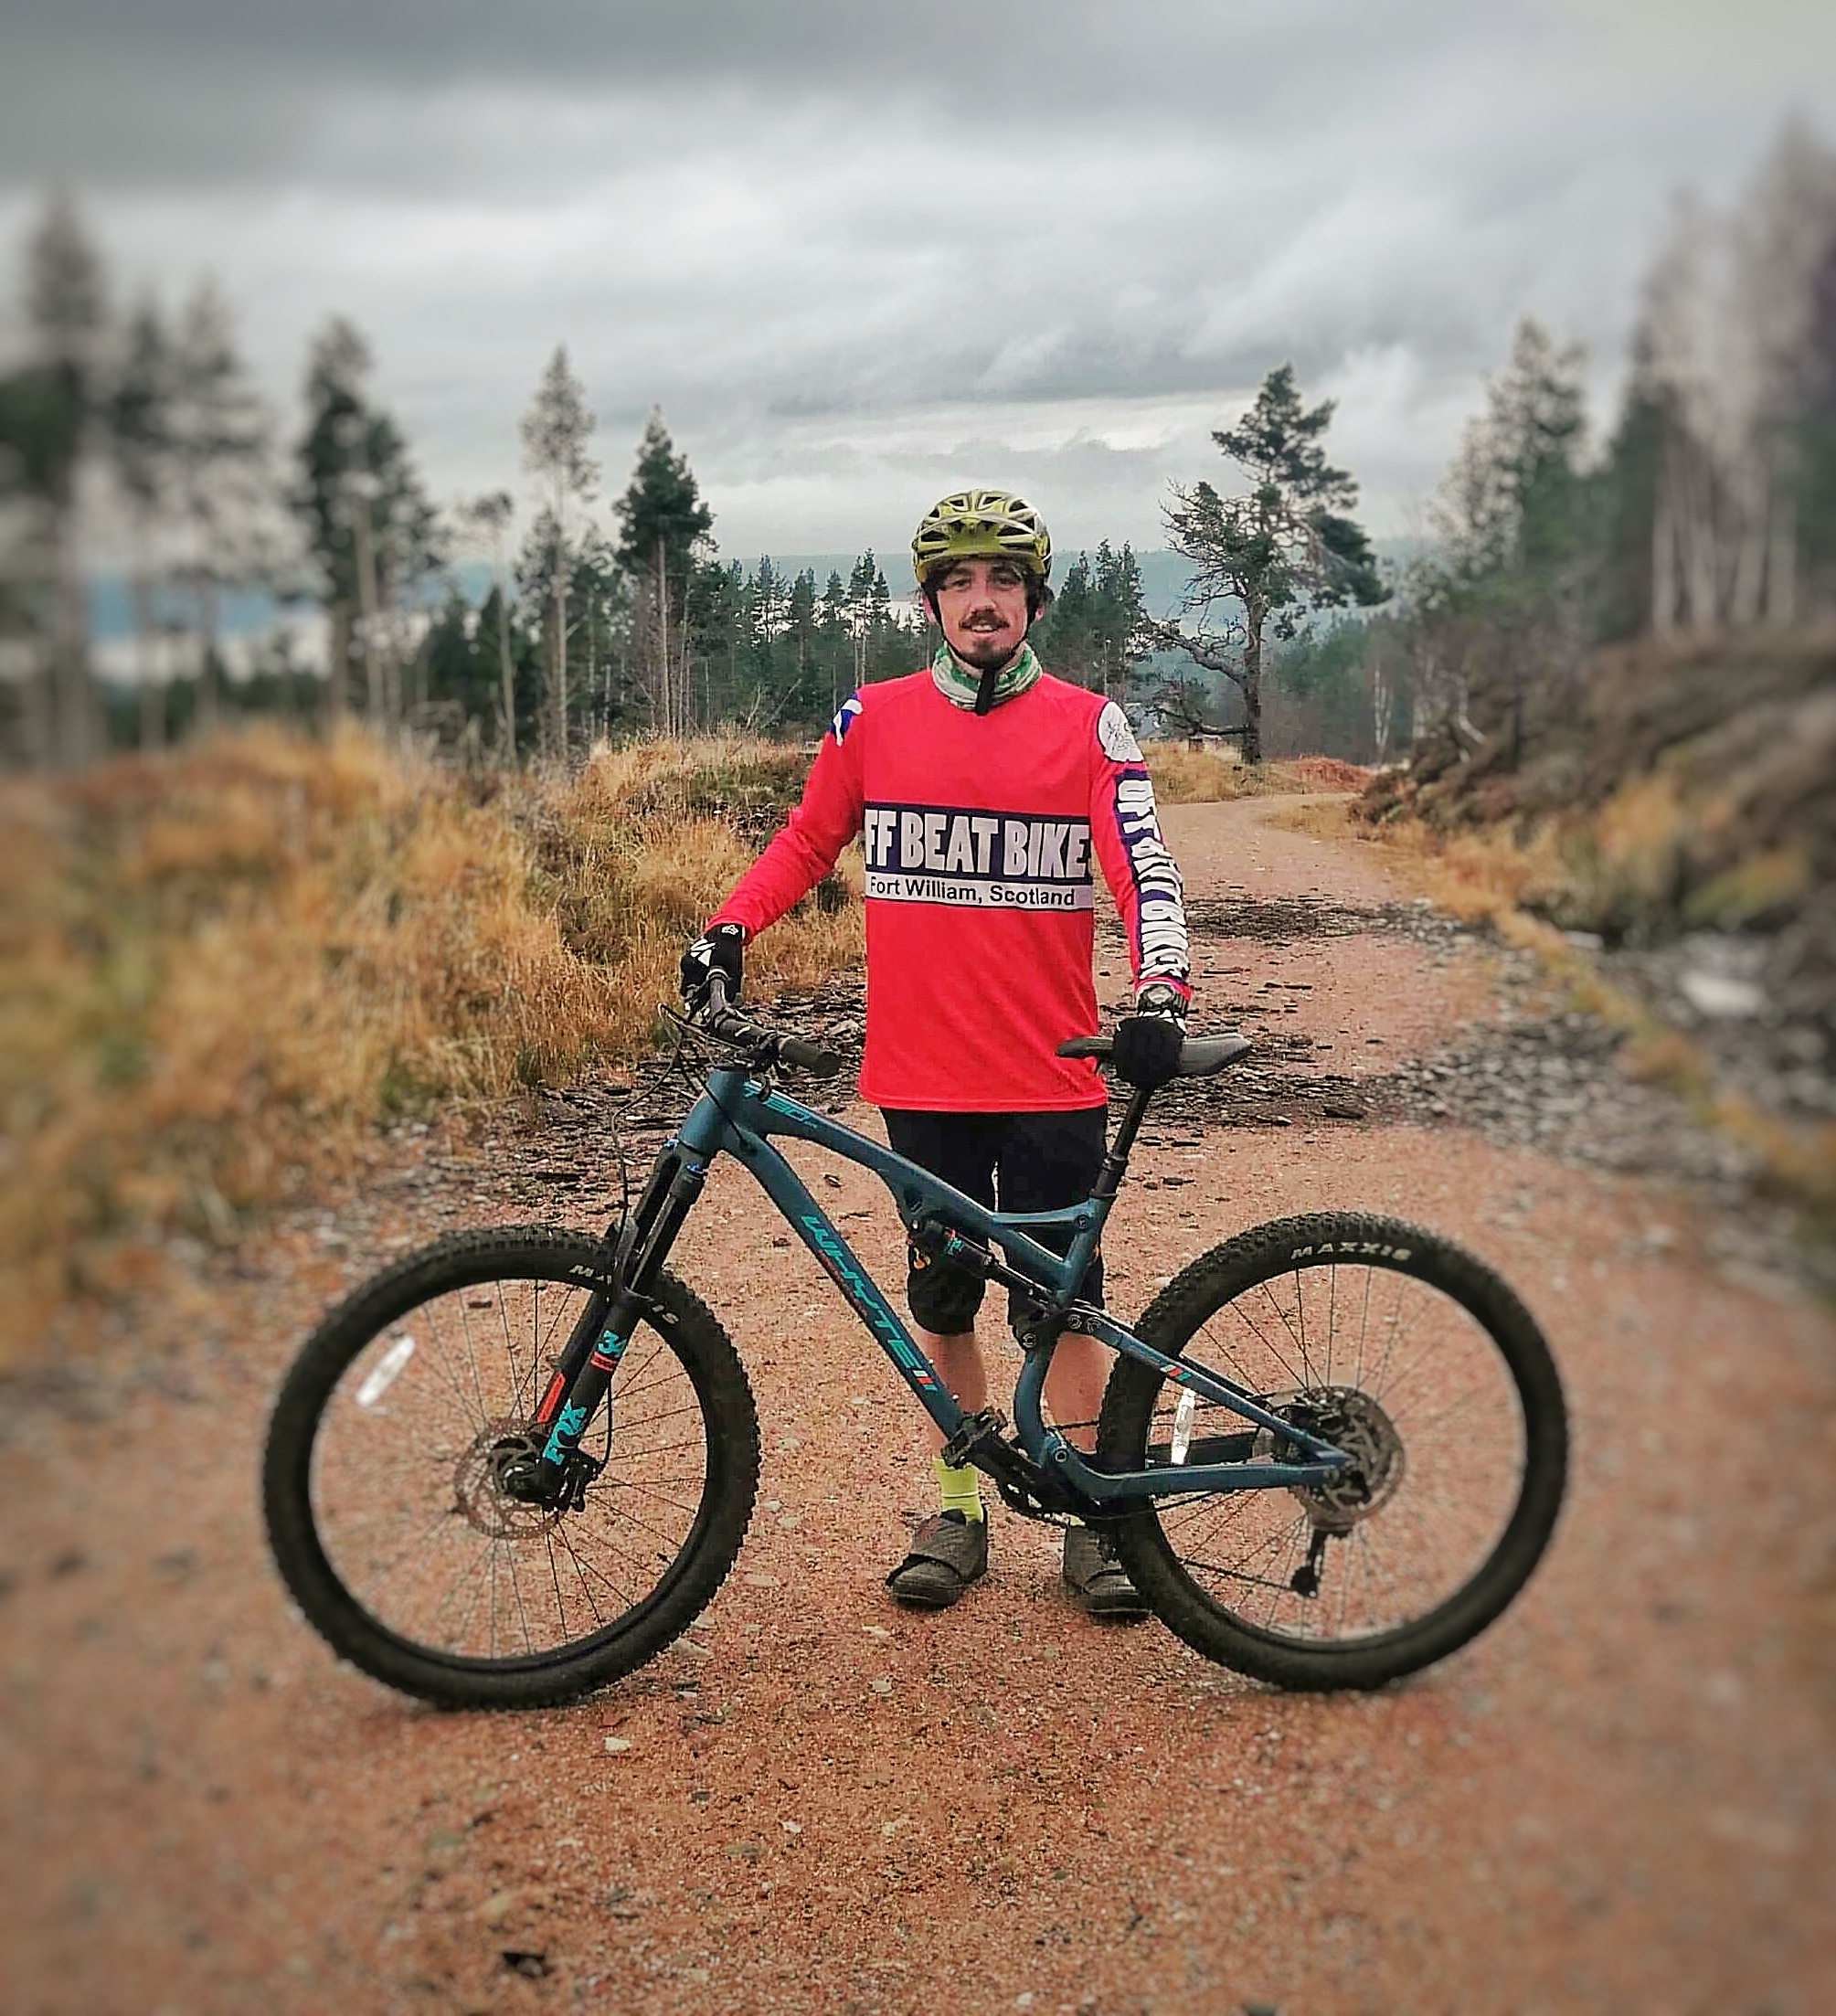 Calum Swanson, Off Beat Bikes